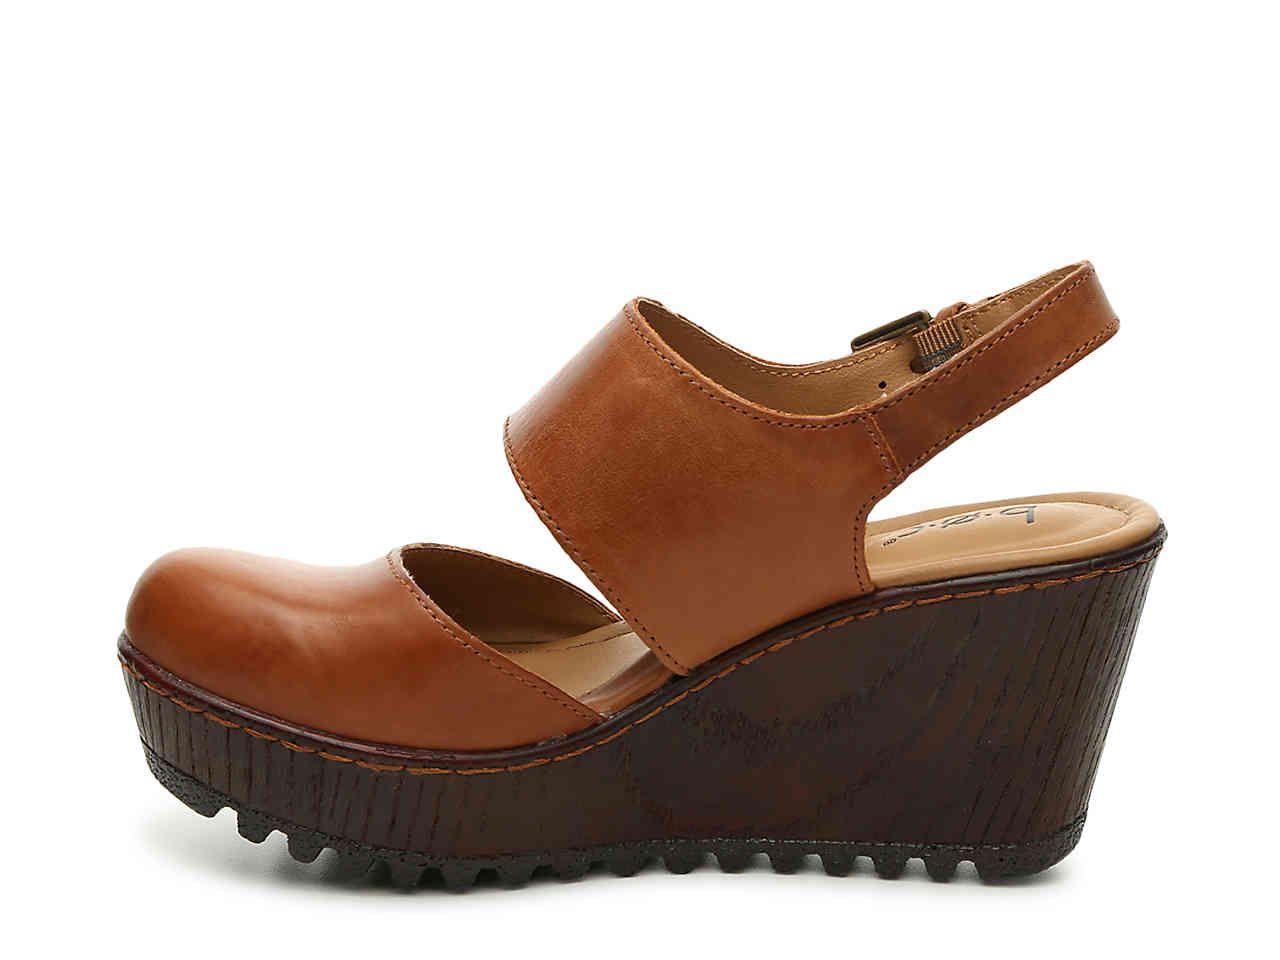 d2dfb081877c b.o.c Helena Wedge Pump Women s Shoes